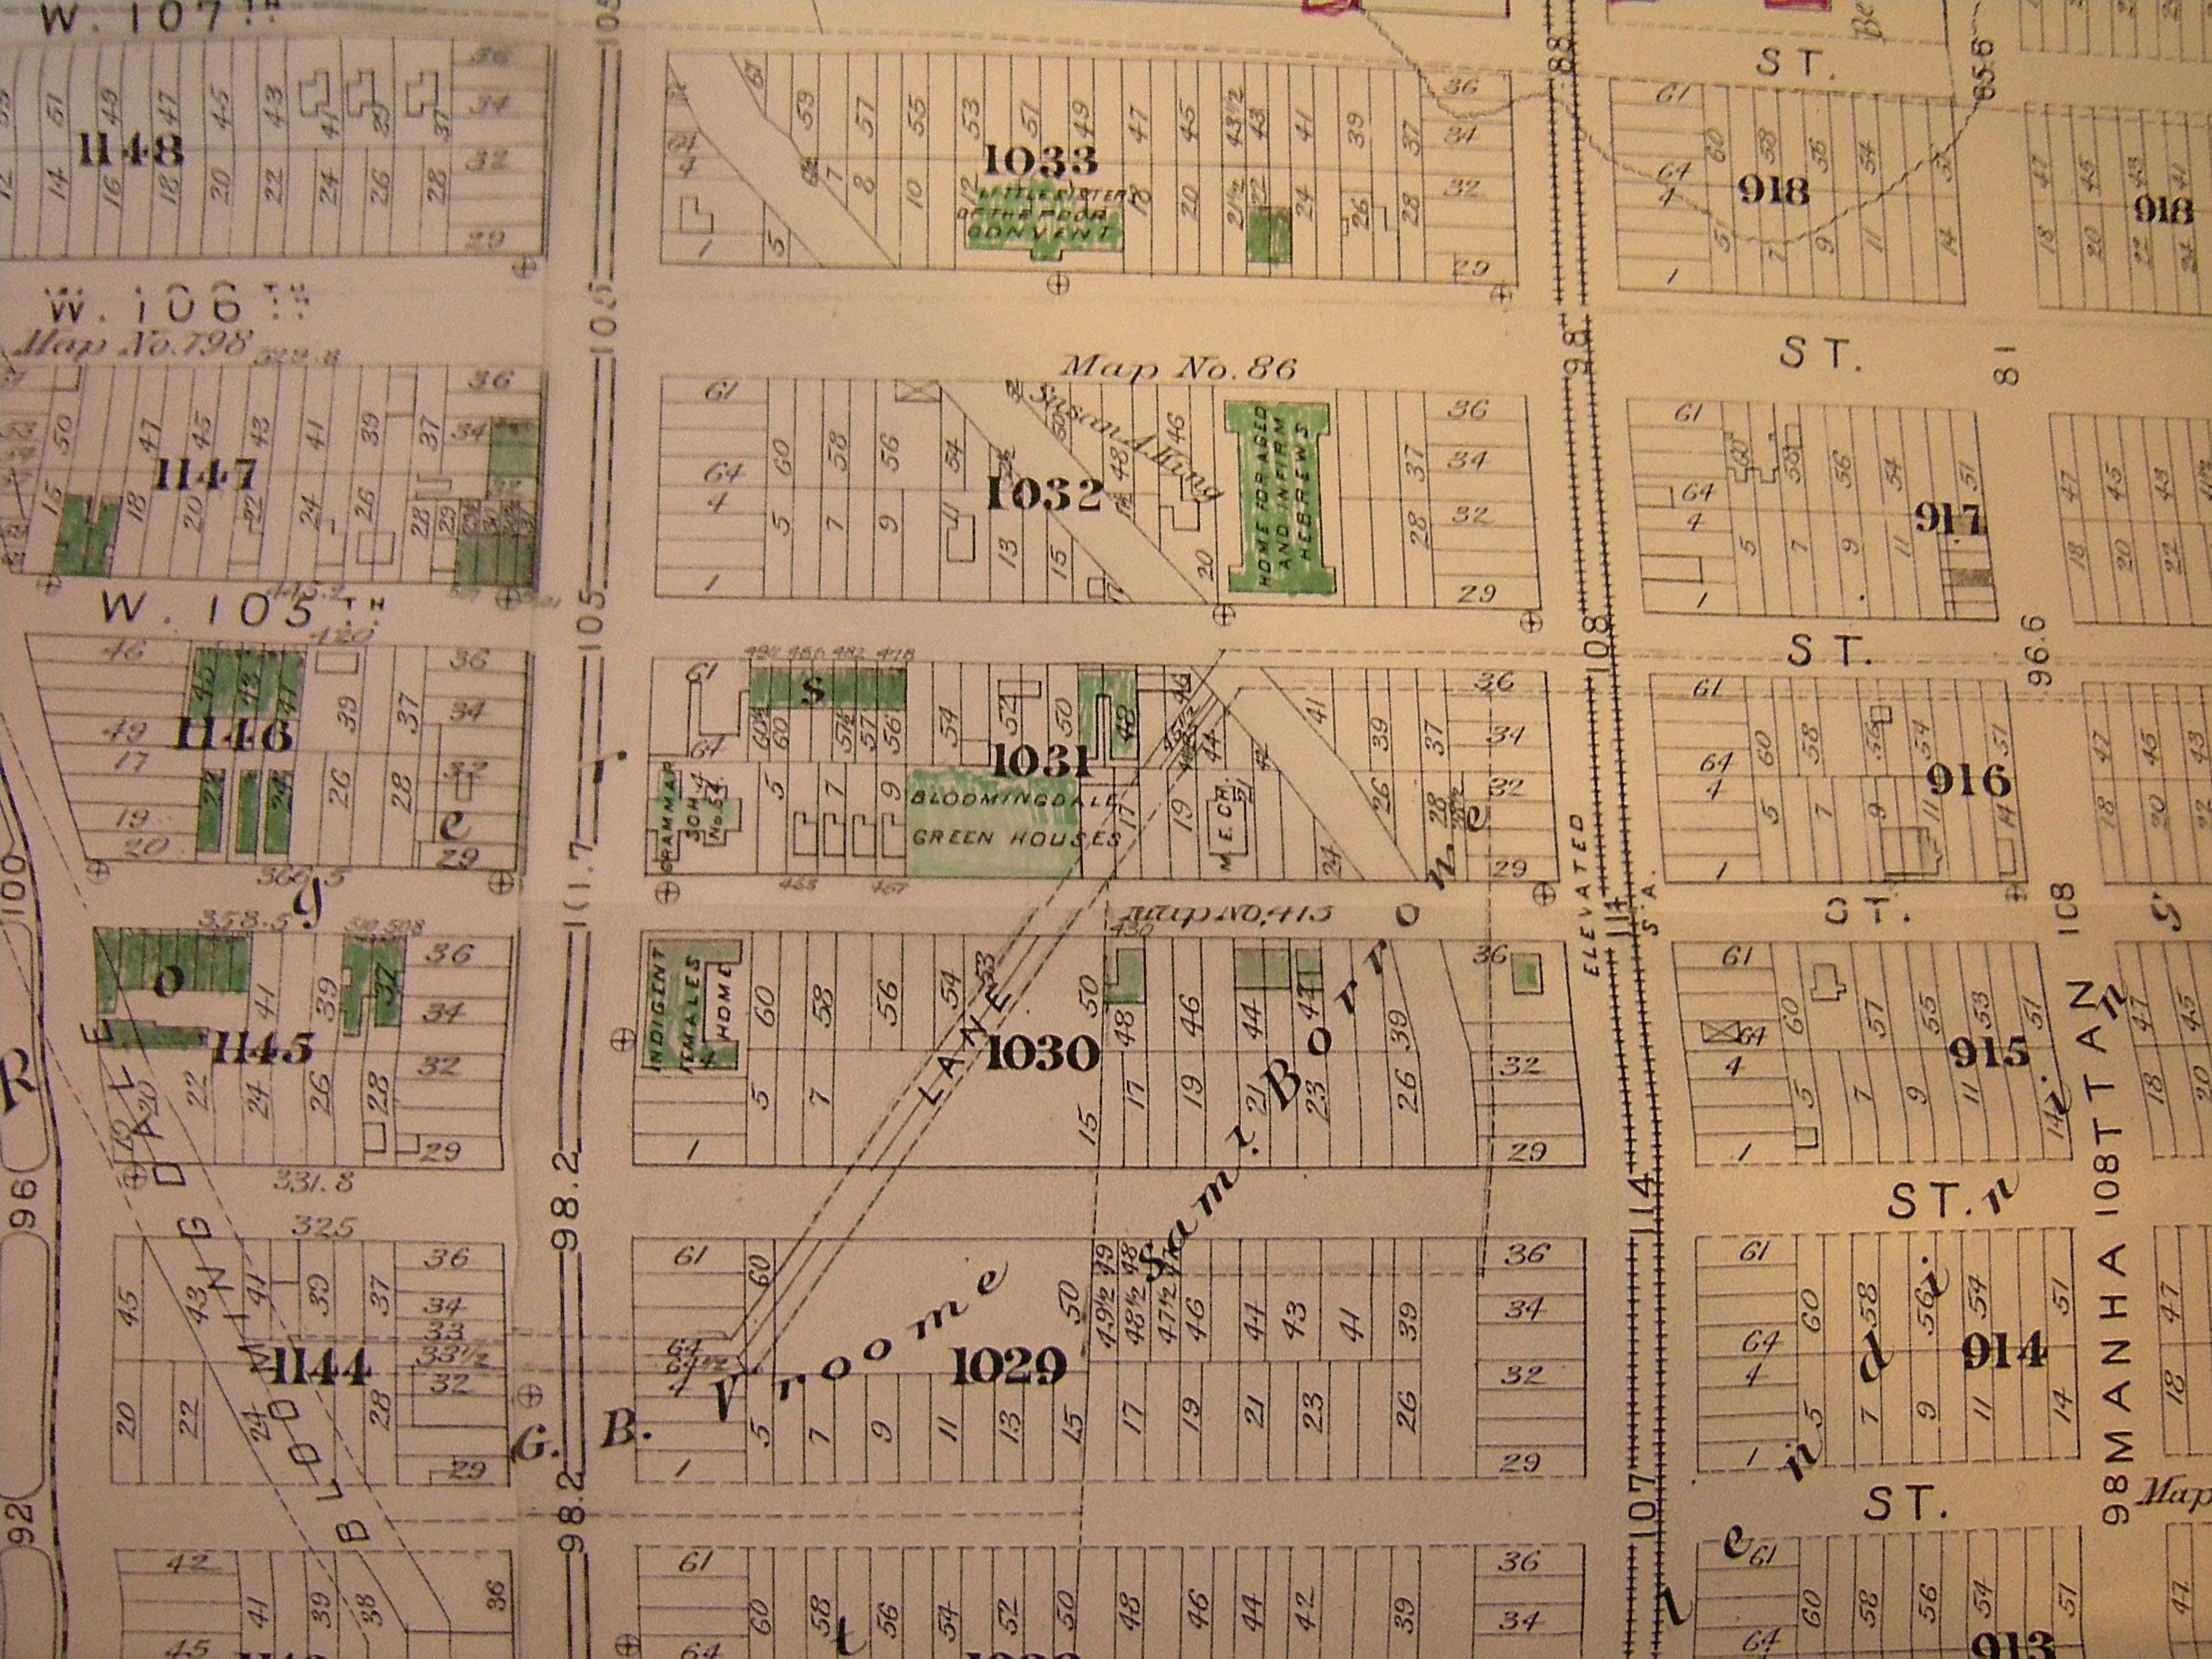 1885 Map Showing Neighborhood Around 891 Amsterdam Avenue